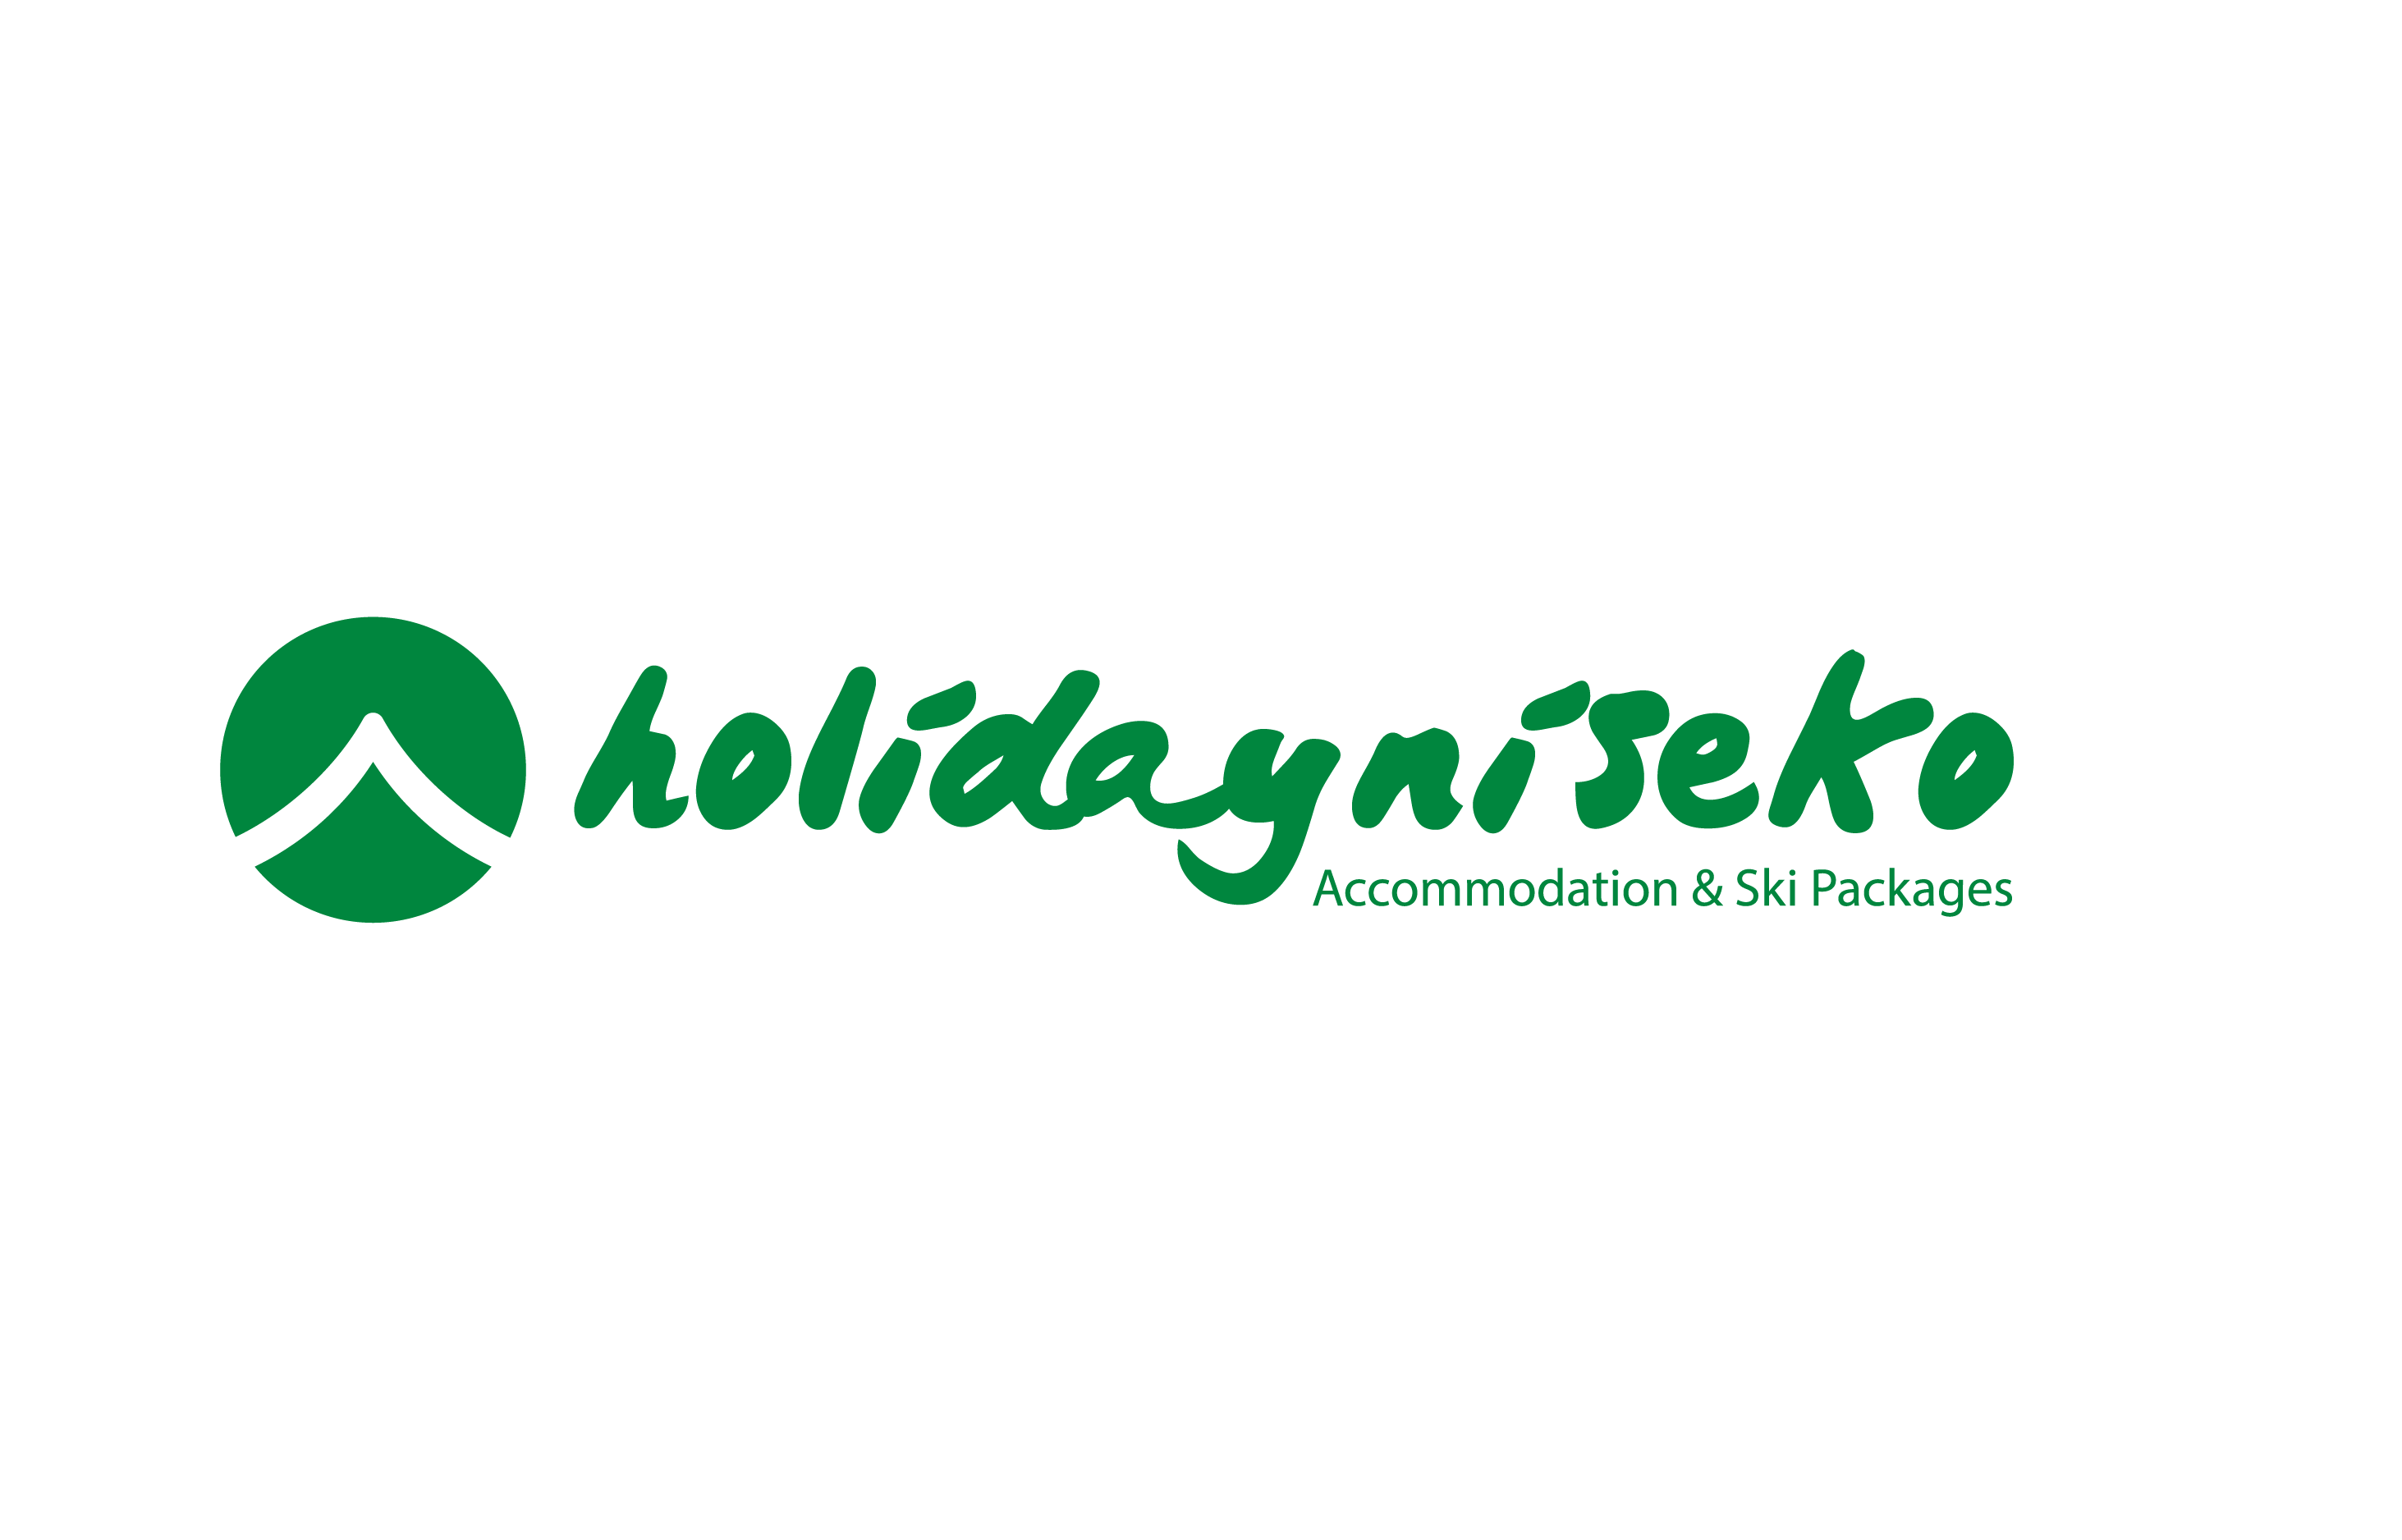 Hn logo specs A1 large green 01